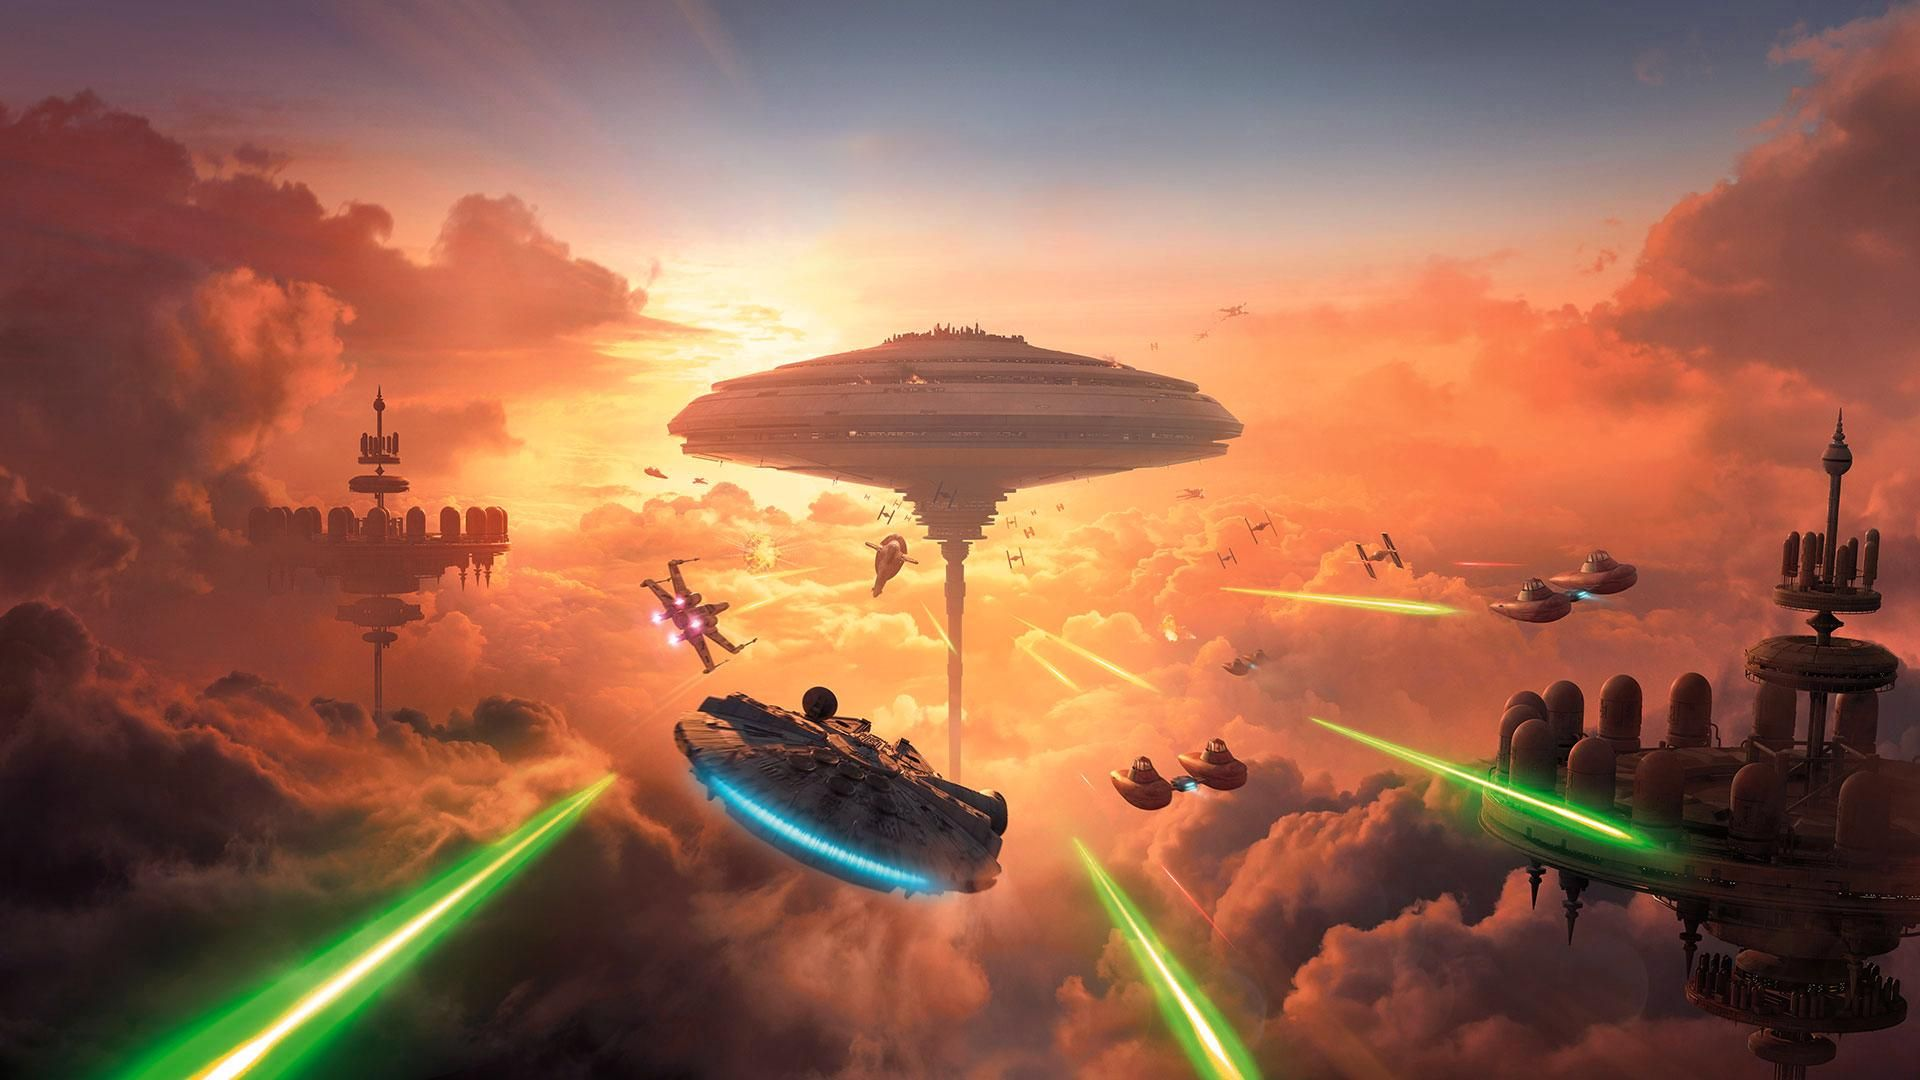 Star Wars Battlefront Bespin Wallpaper 1920x1080 Star Wars Games Cloud City Battlefront